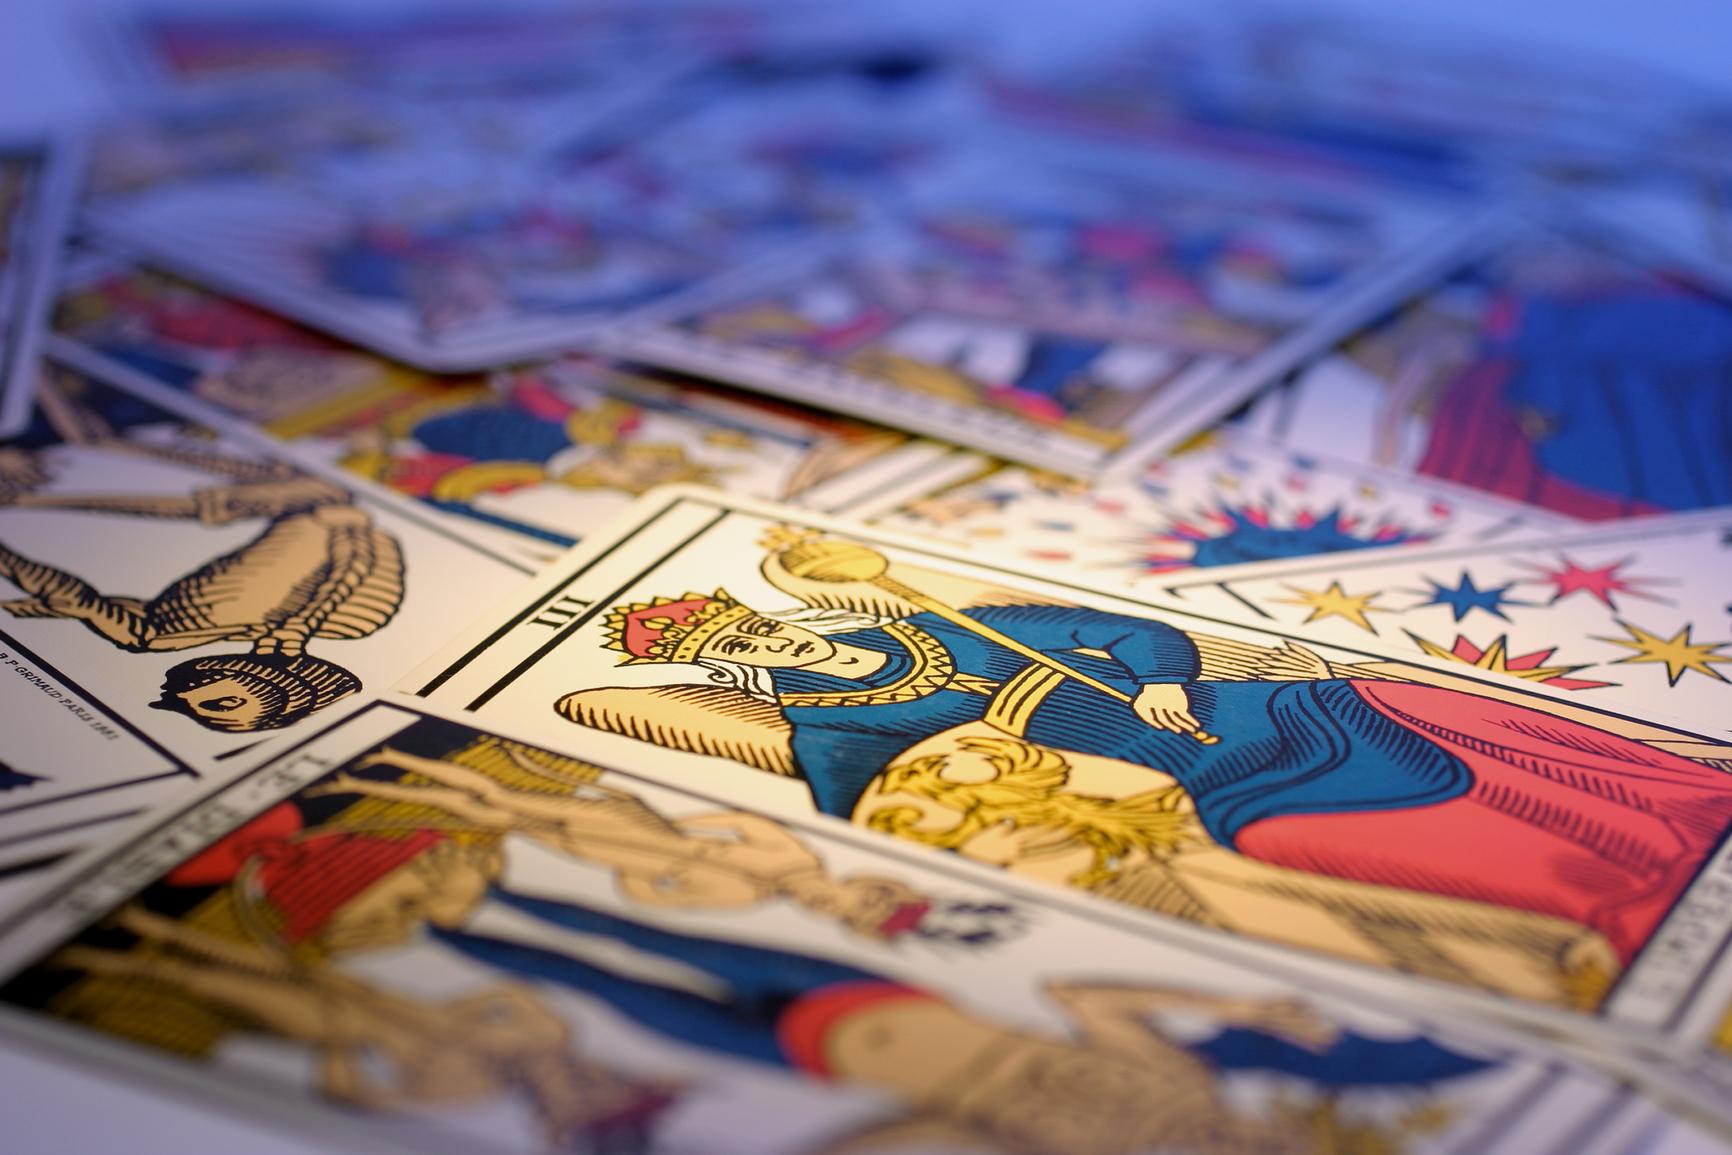 Tarot Cards in Warm Cast